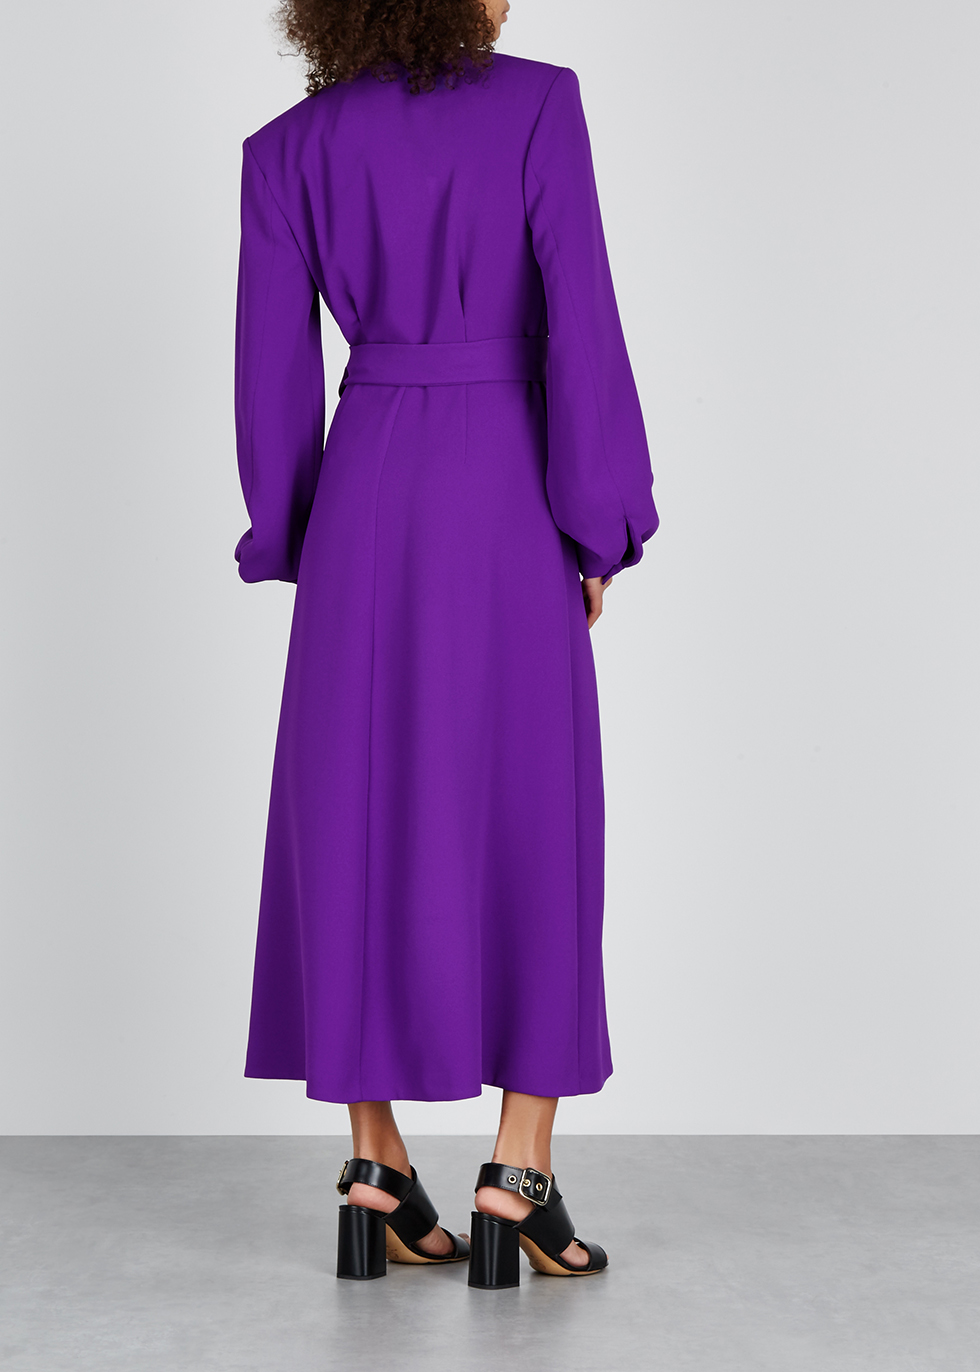 Dove purple midi wrap dress - Dries Van Noten